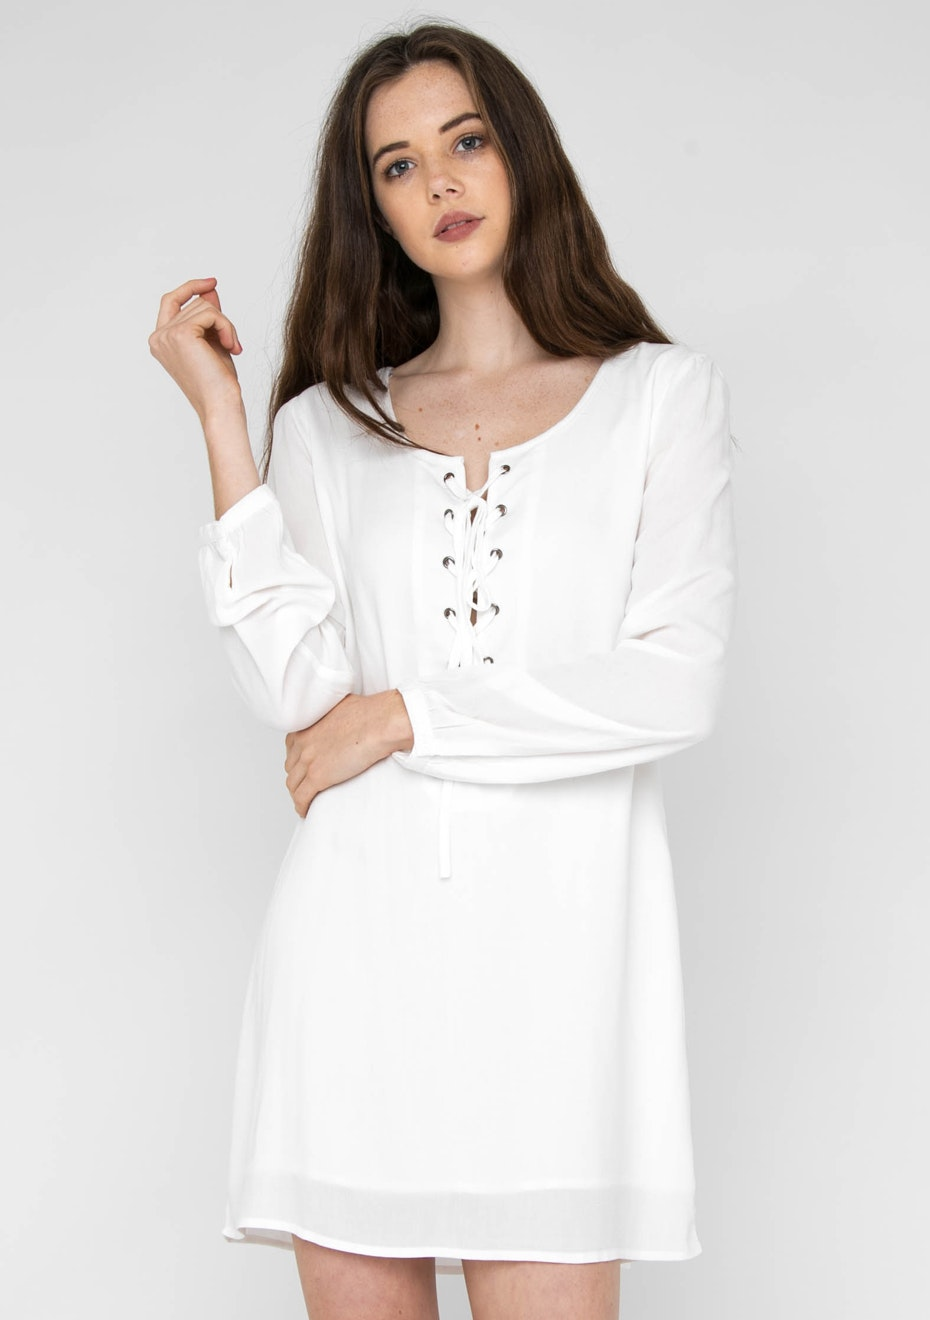 Jorge - Tied Up Dress - Antique White